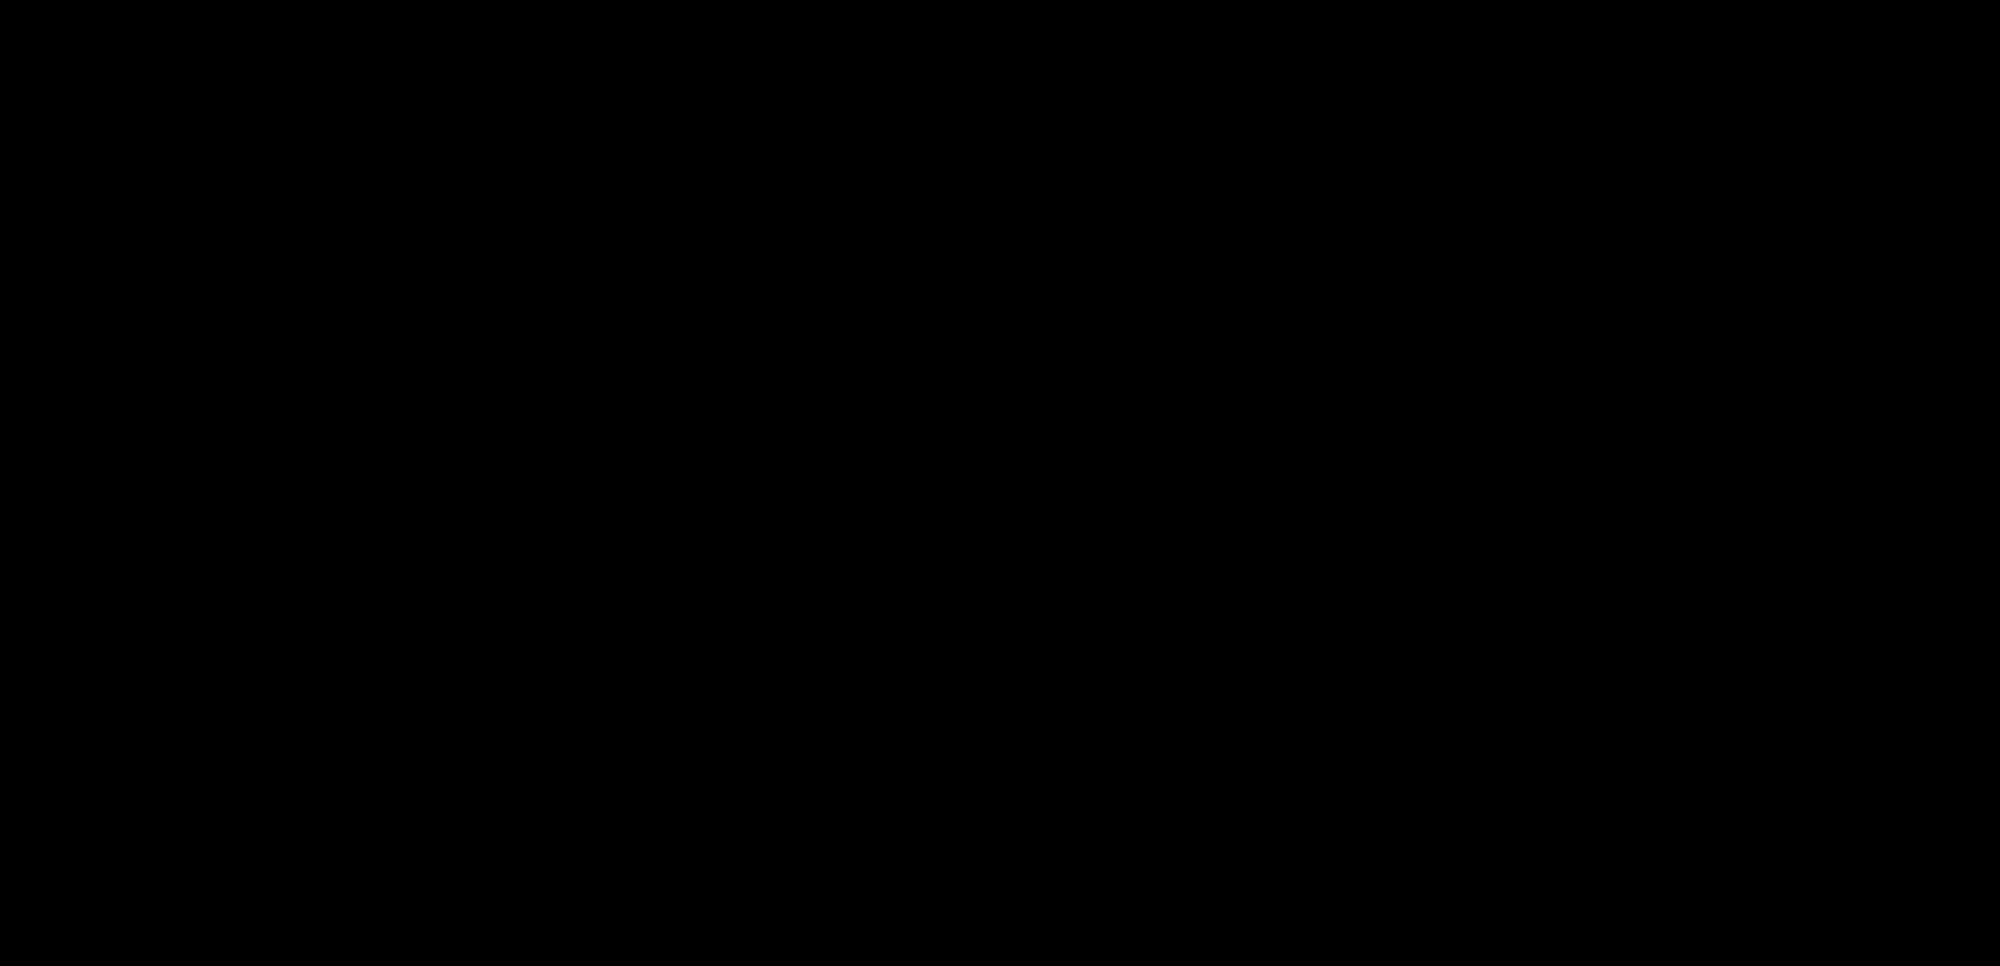 Dolce & Gabbana Logos Pinterest